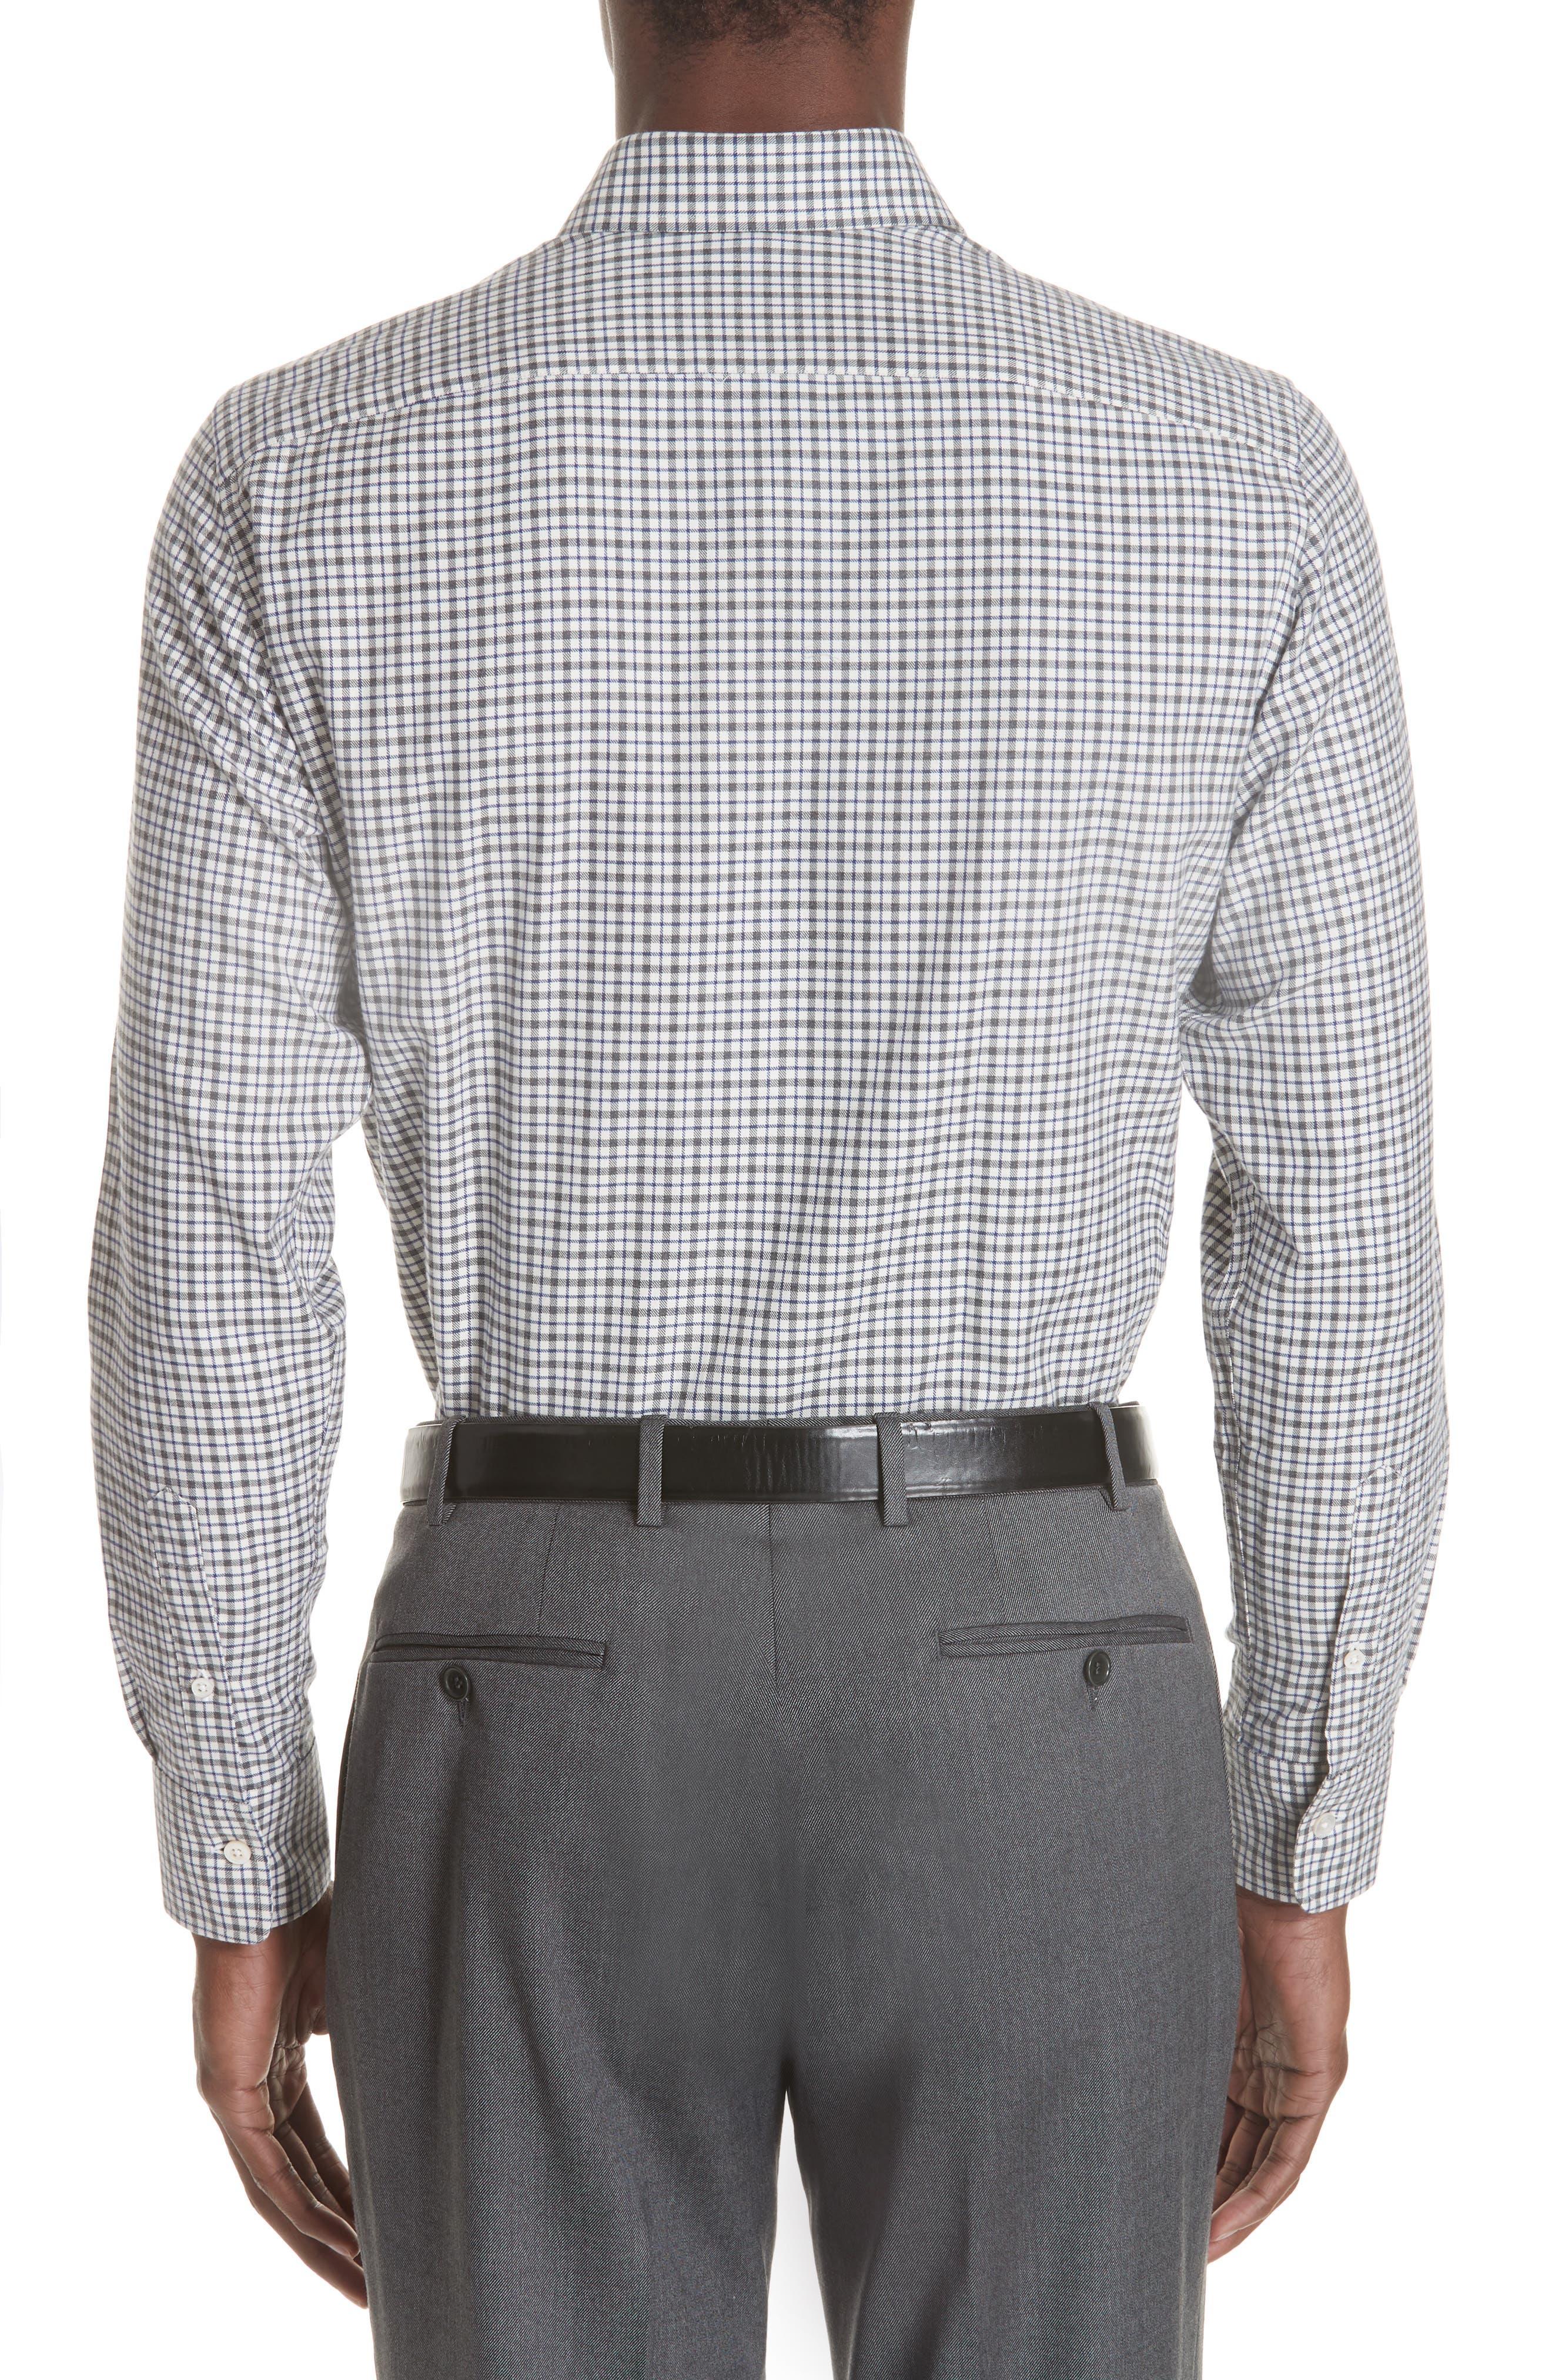 Regular Fit Check Dress Shirt,                             Alternate thumbnail 3, color,                             GREY